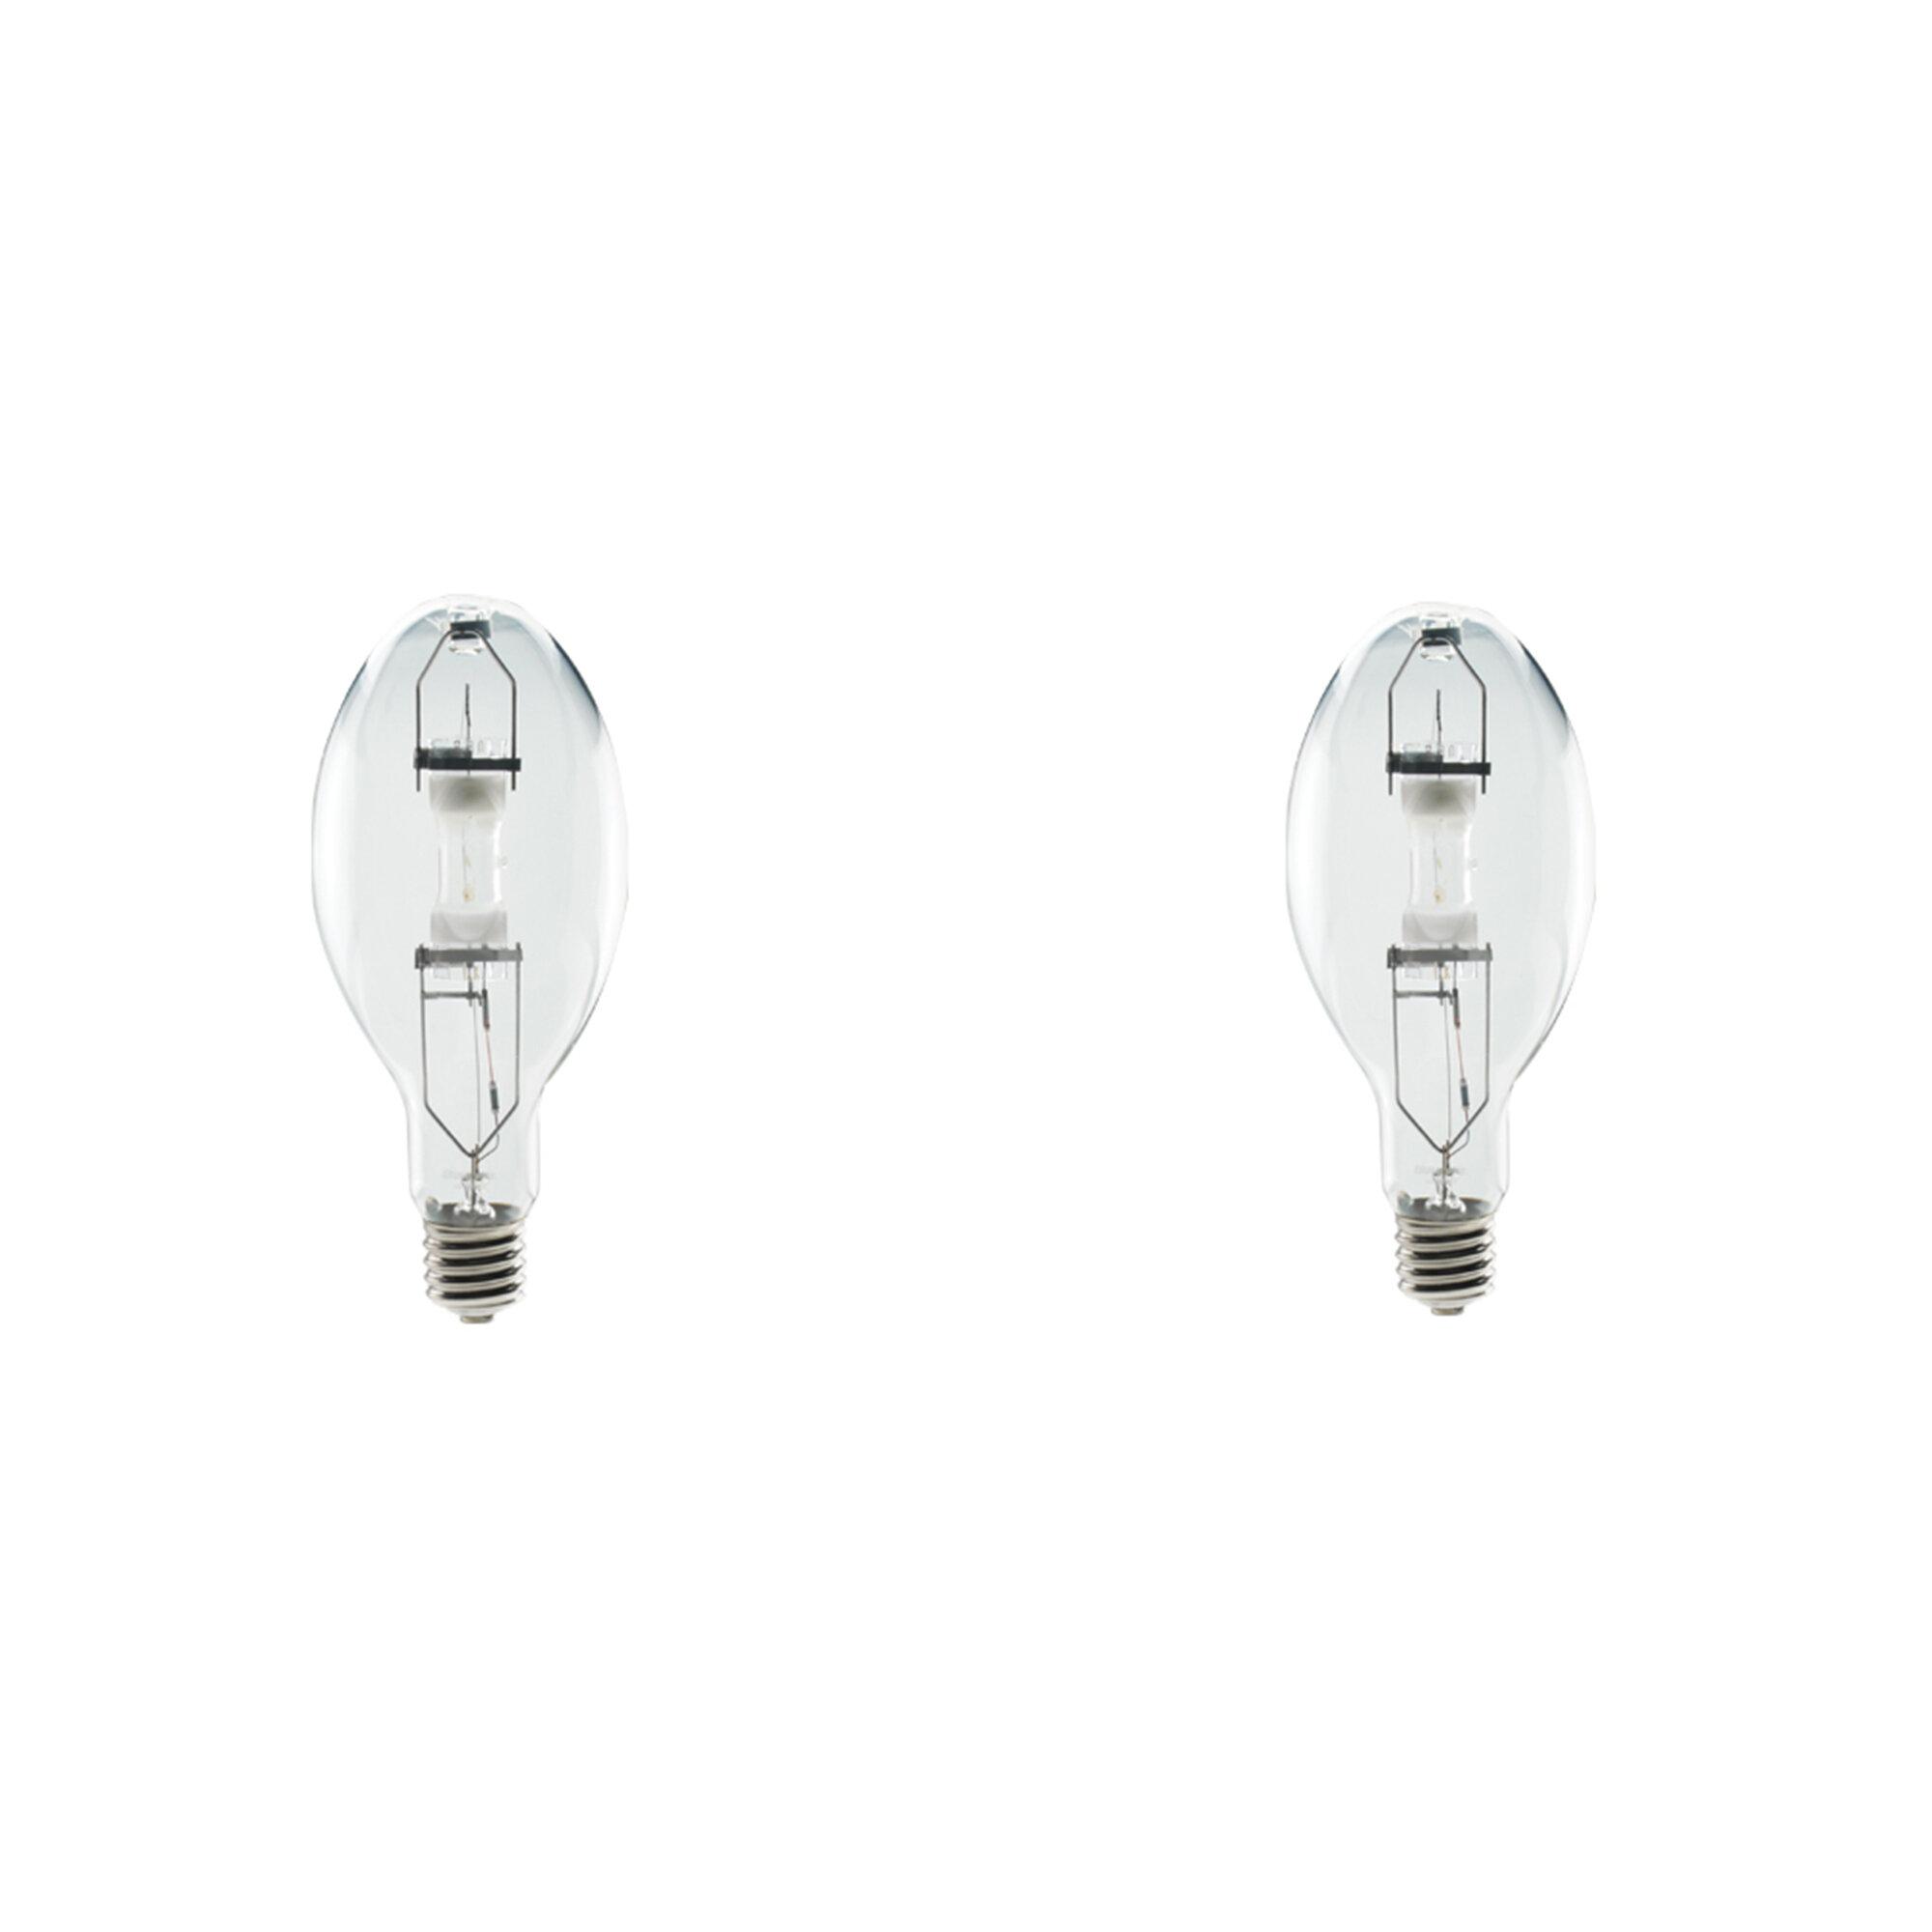 Bulbrite Hid Ed23 5 High Pressure Sodium Mogul E39 Base Universal Burn Light Bulb 50 Watt Clear Coslab Uk